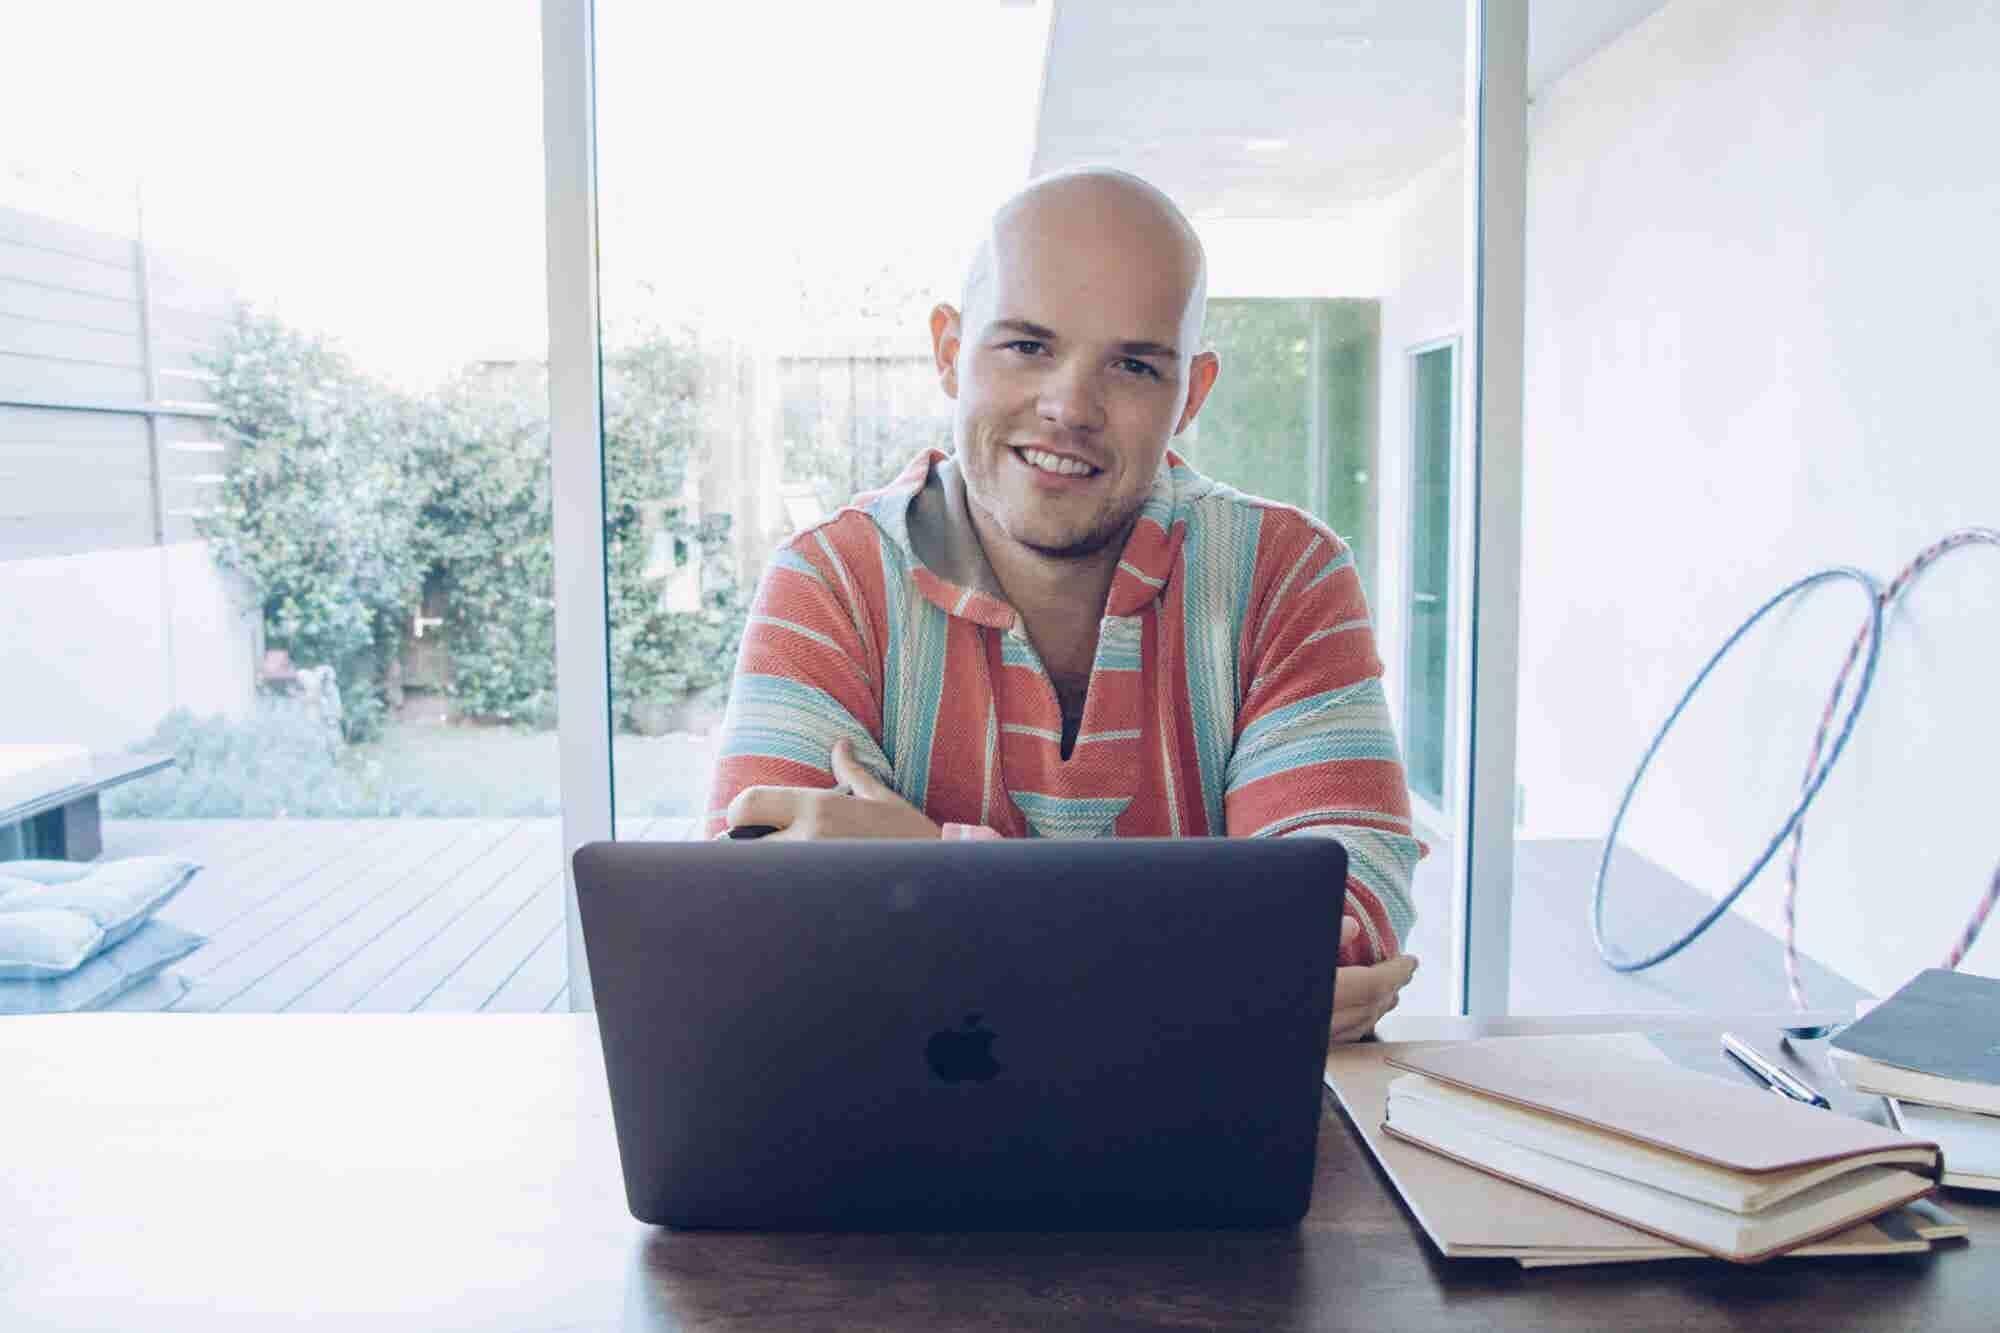 Why I Shut Down a Multi-Million Dollar Business to Solve the 'Entrepreneur's Dilemma'